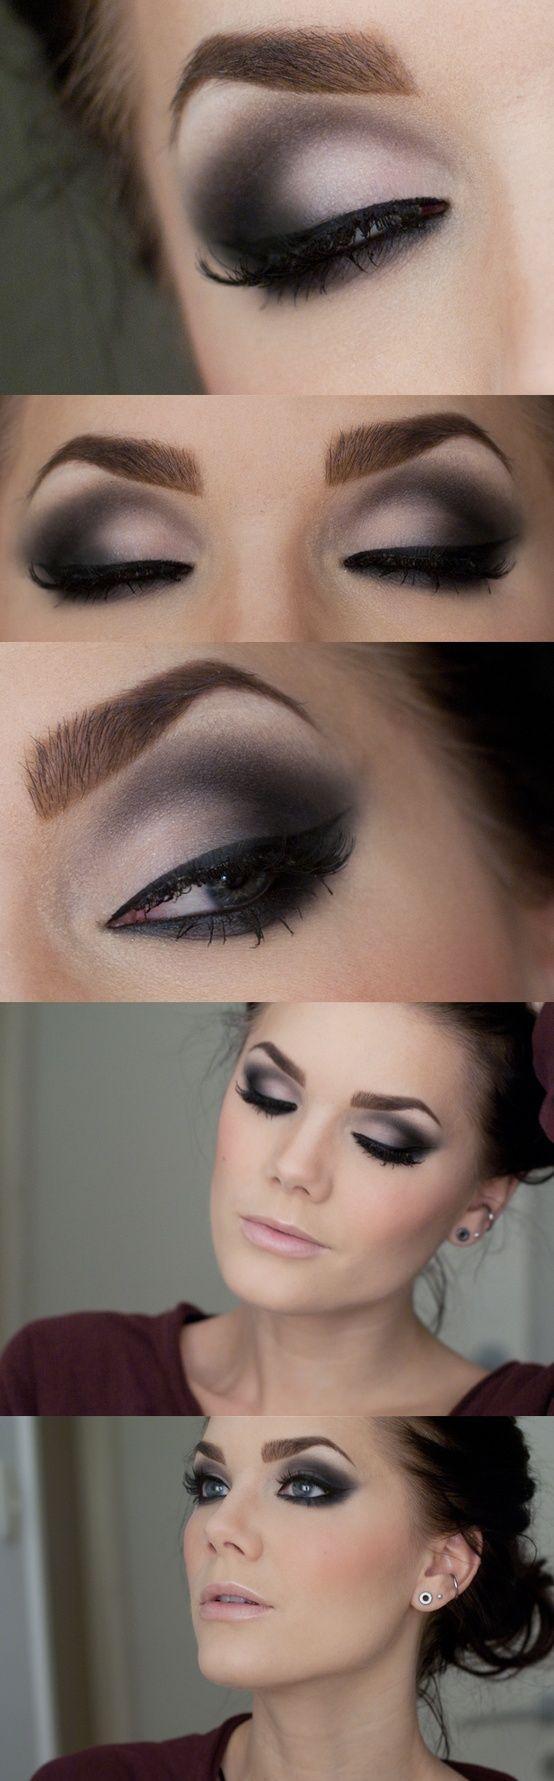 50 Shades of Darker Makeup Tutorials You Must See